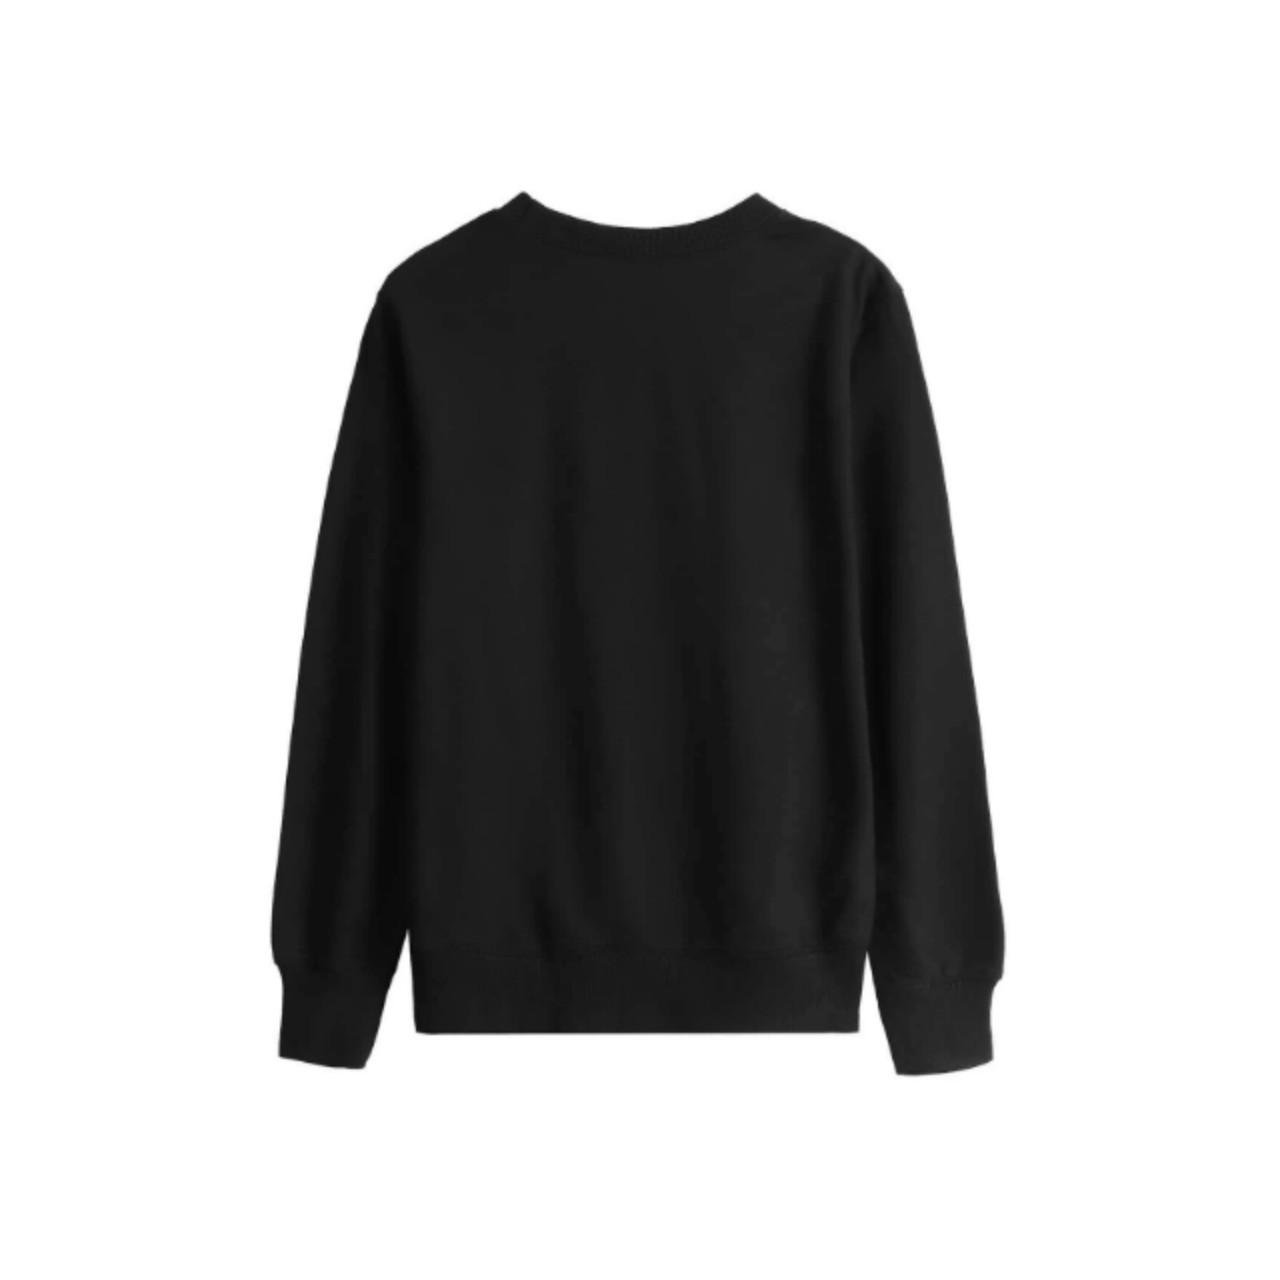 Hands and graphic print sweatshirt xxl